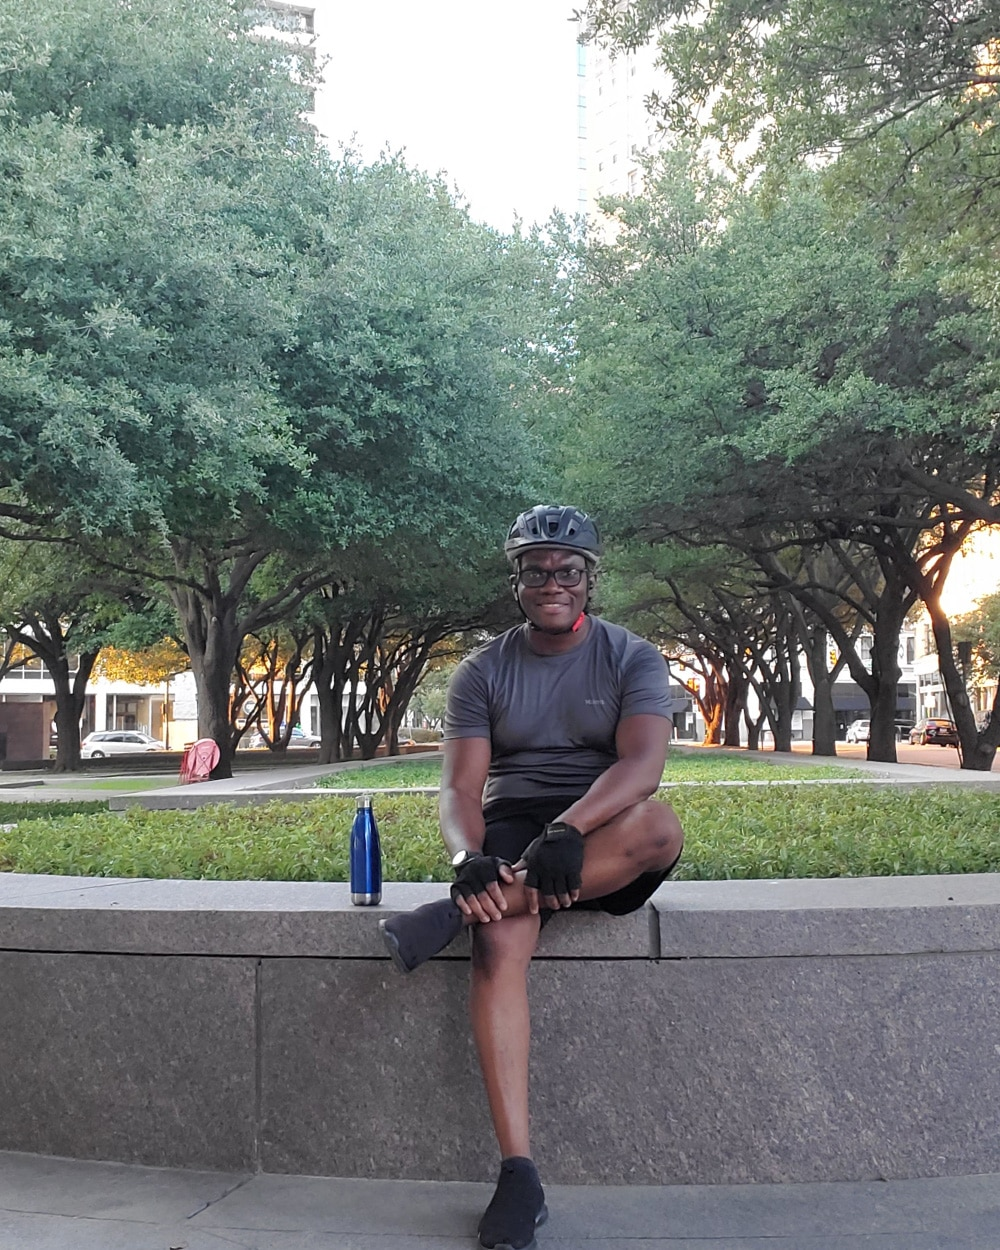 chukwuagozie agozie iloma do fun - Fort Worth EM Residency Program